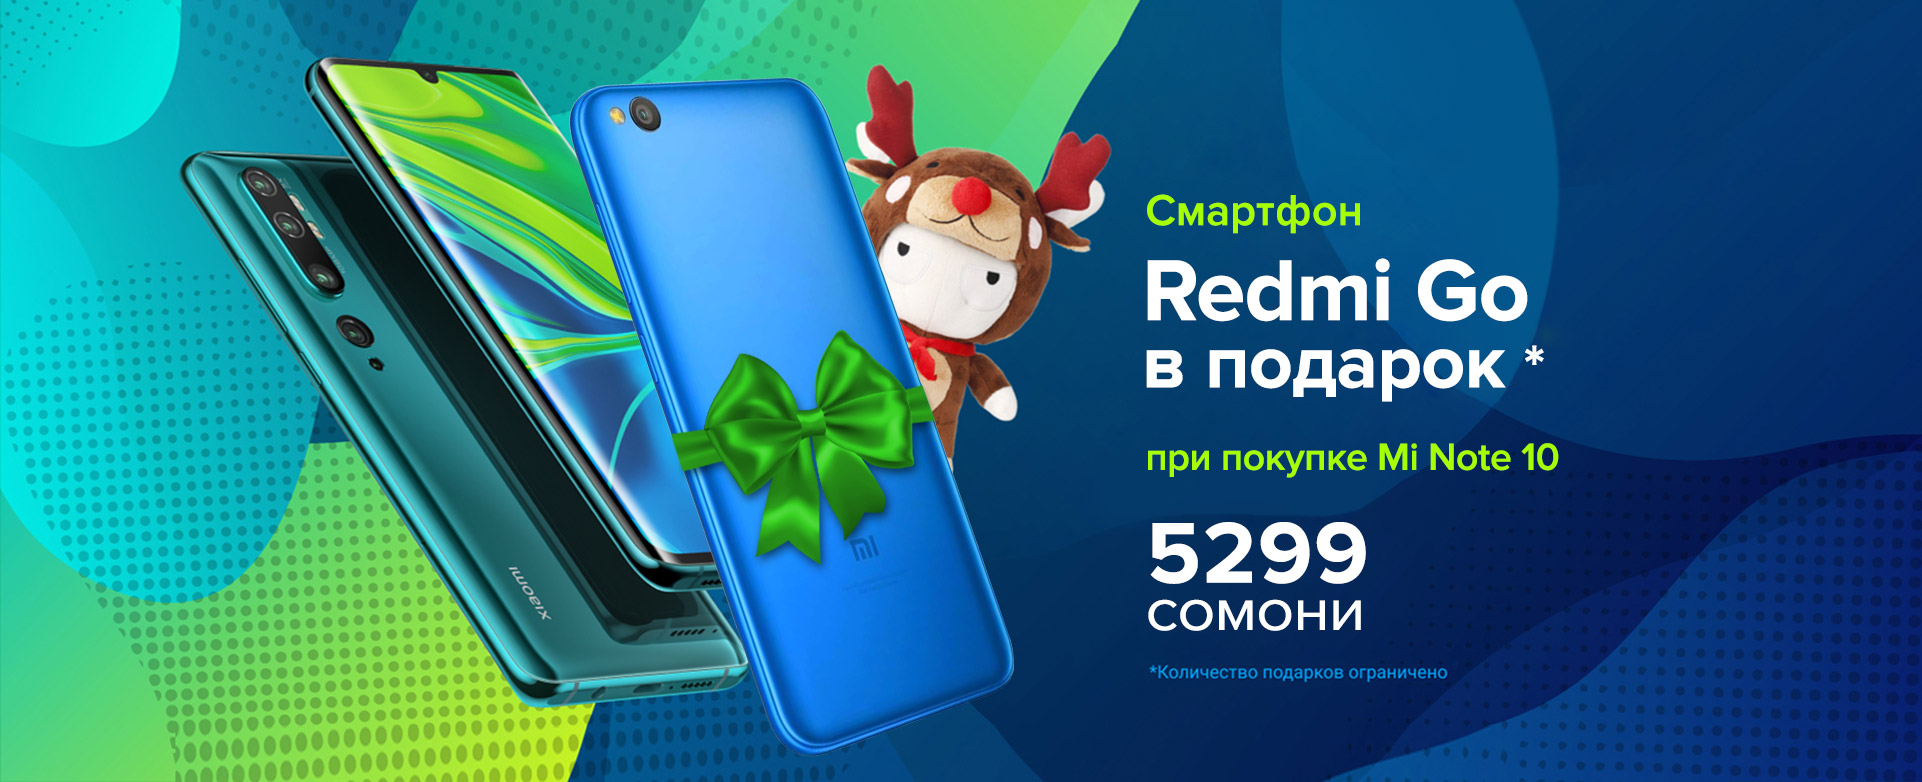 Купи Mi Note 10 получи в подарок Redmi Go!